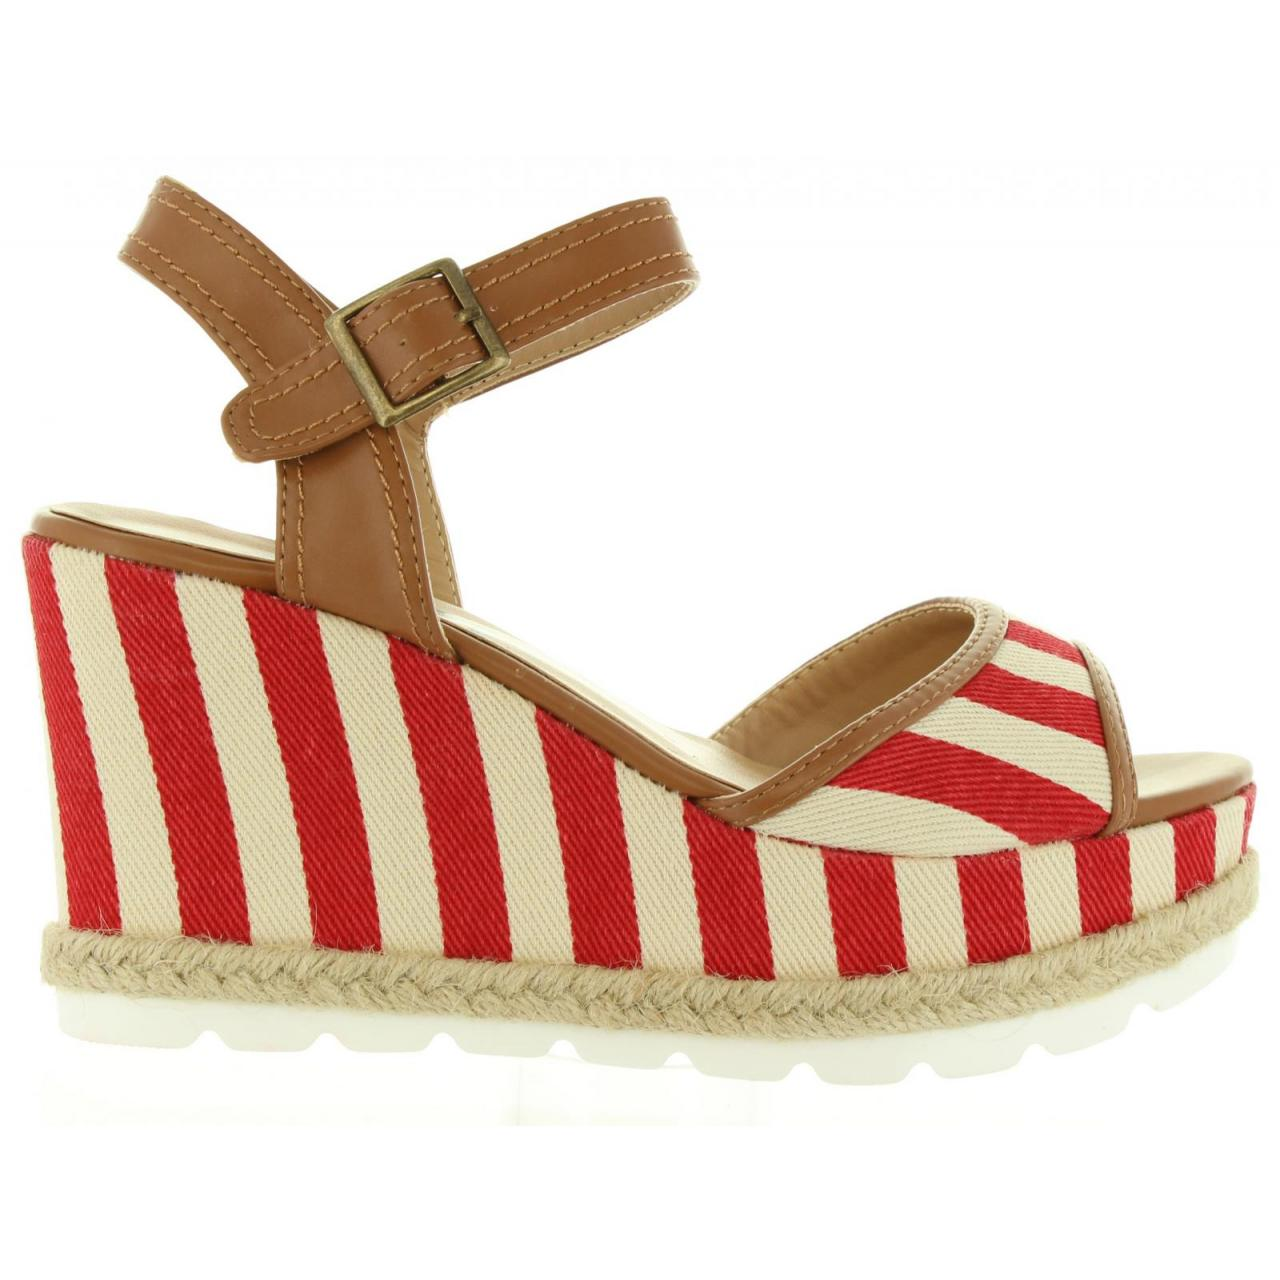 Dámske letné sandále na platforme REFRESH 63508 červené  9363d6b3a53